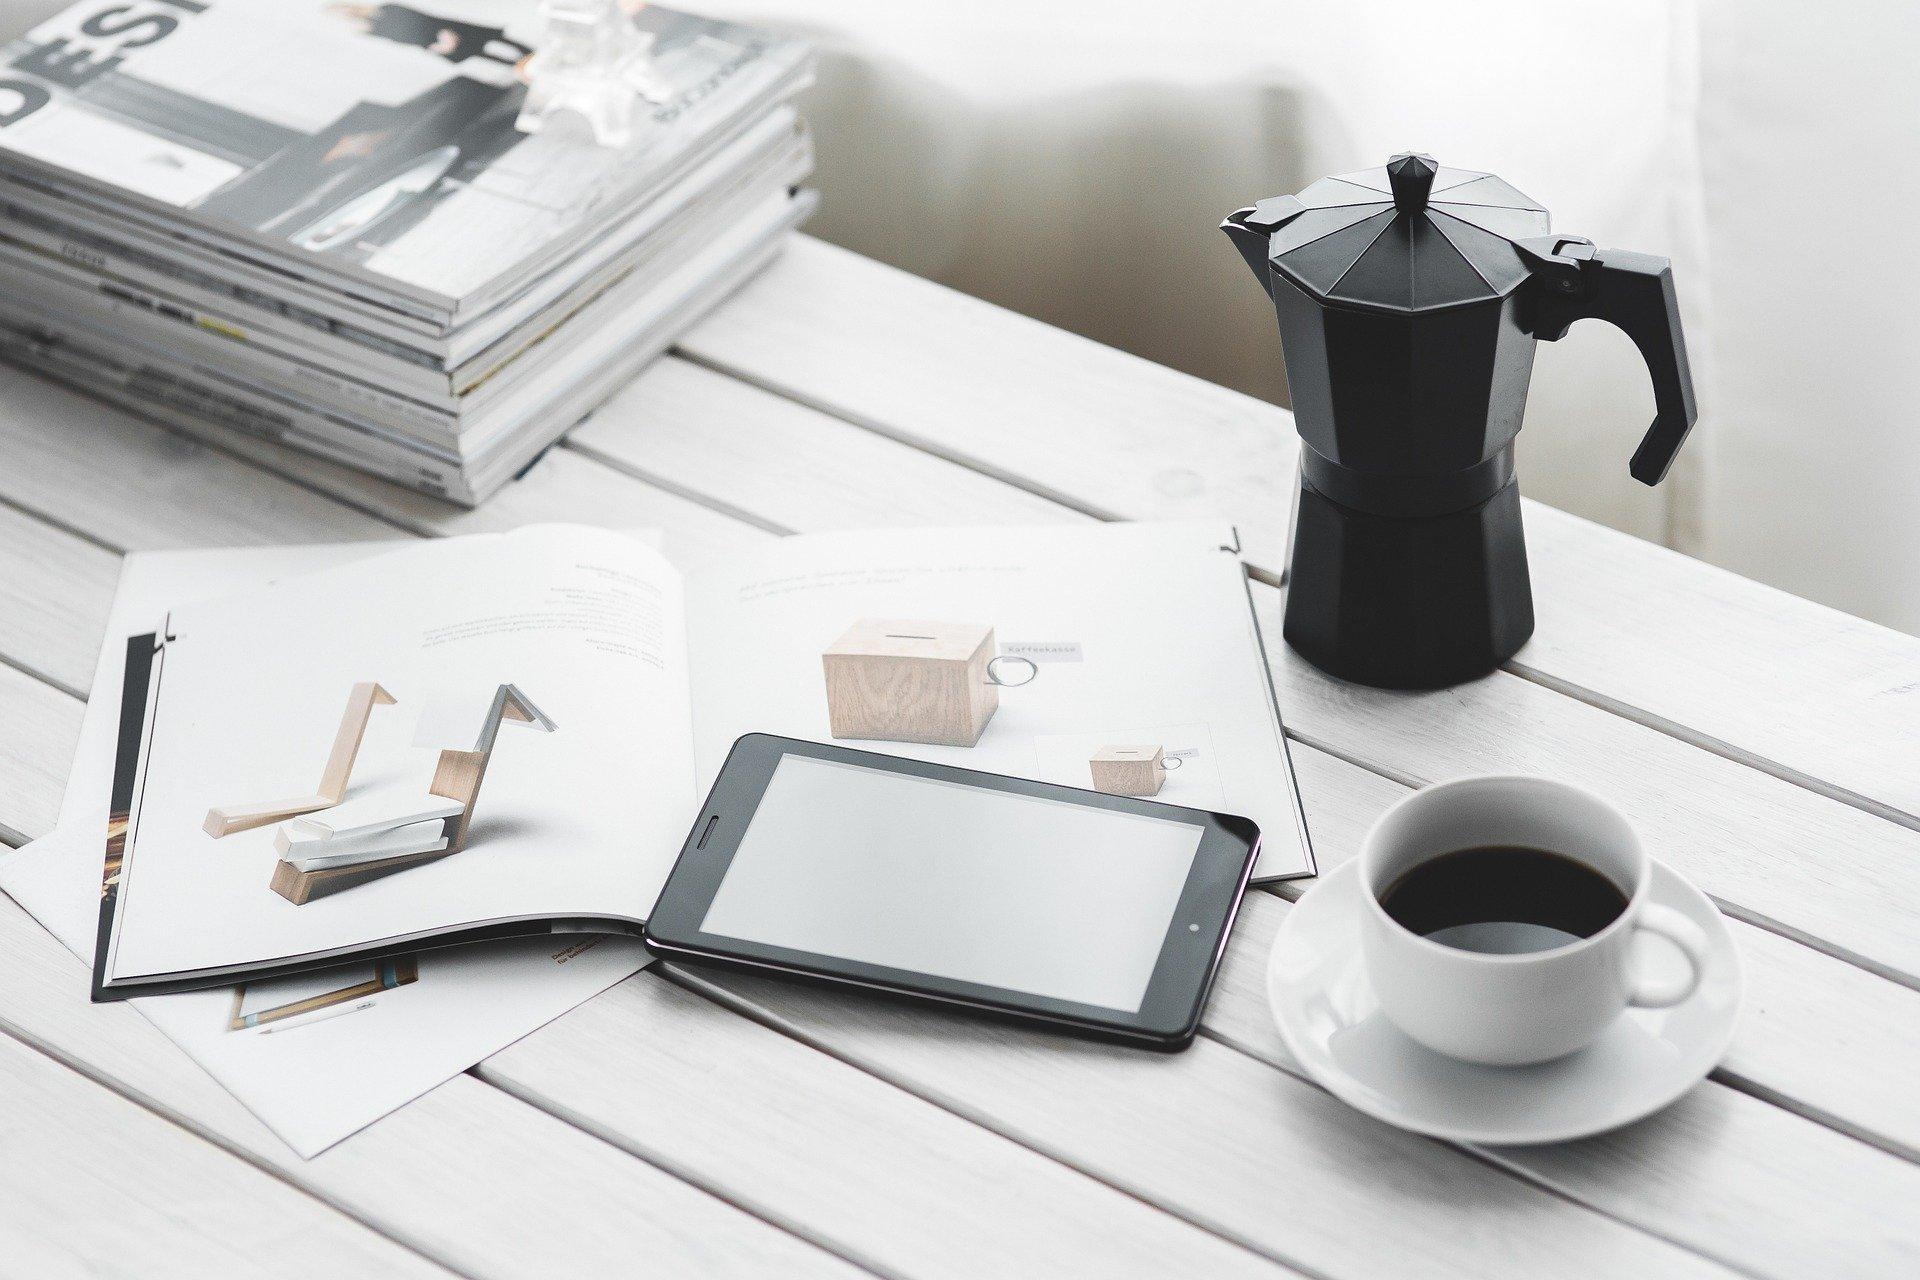 antivol tablette antivol smartphone - Blog SFAM